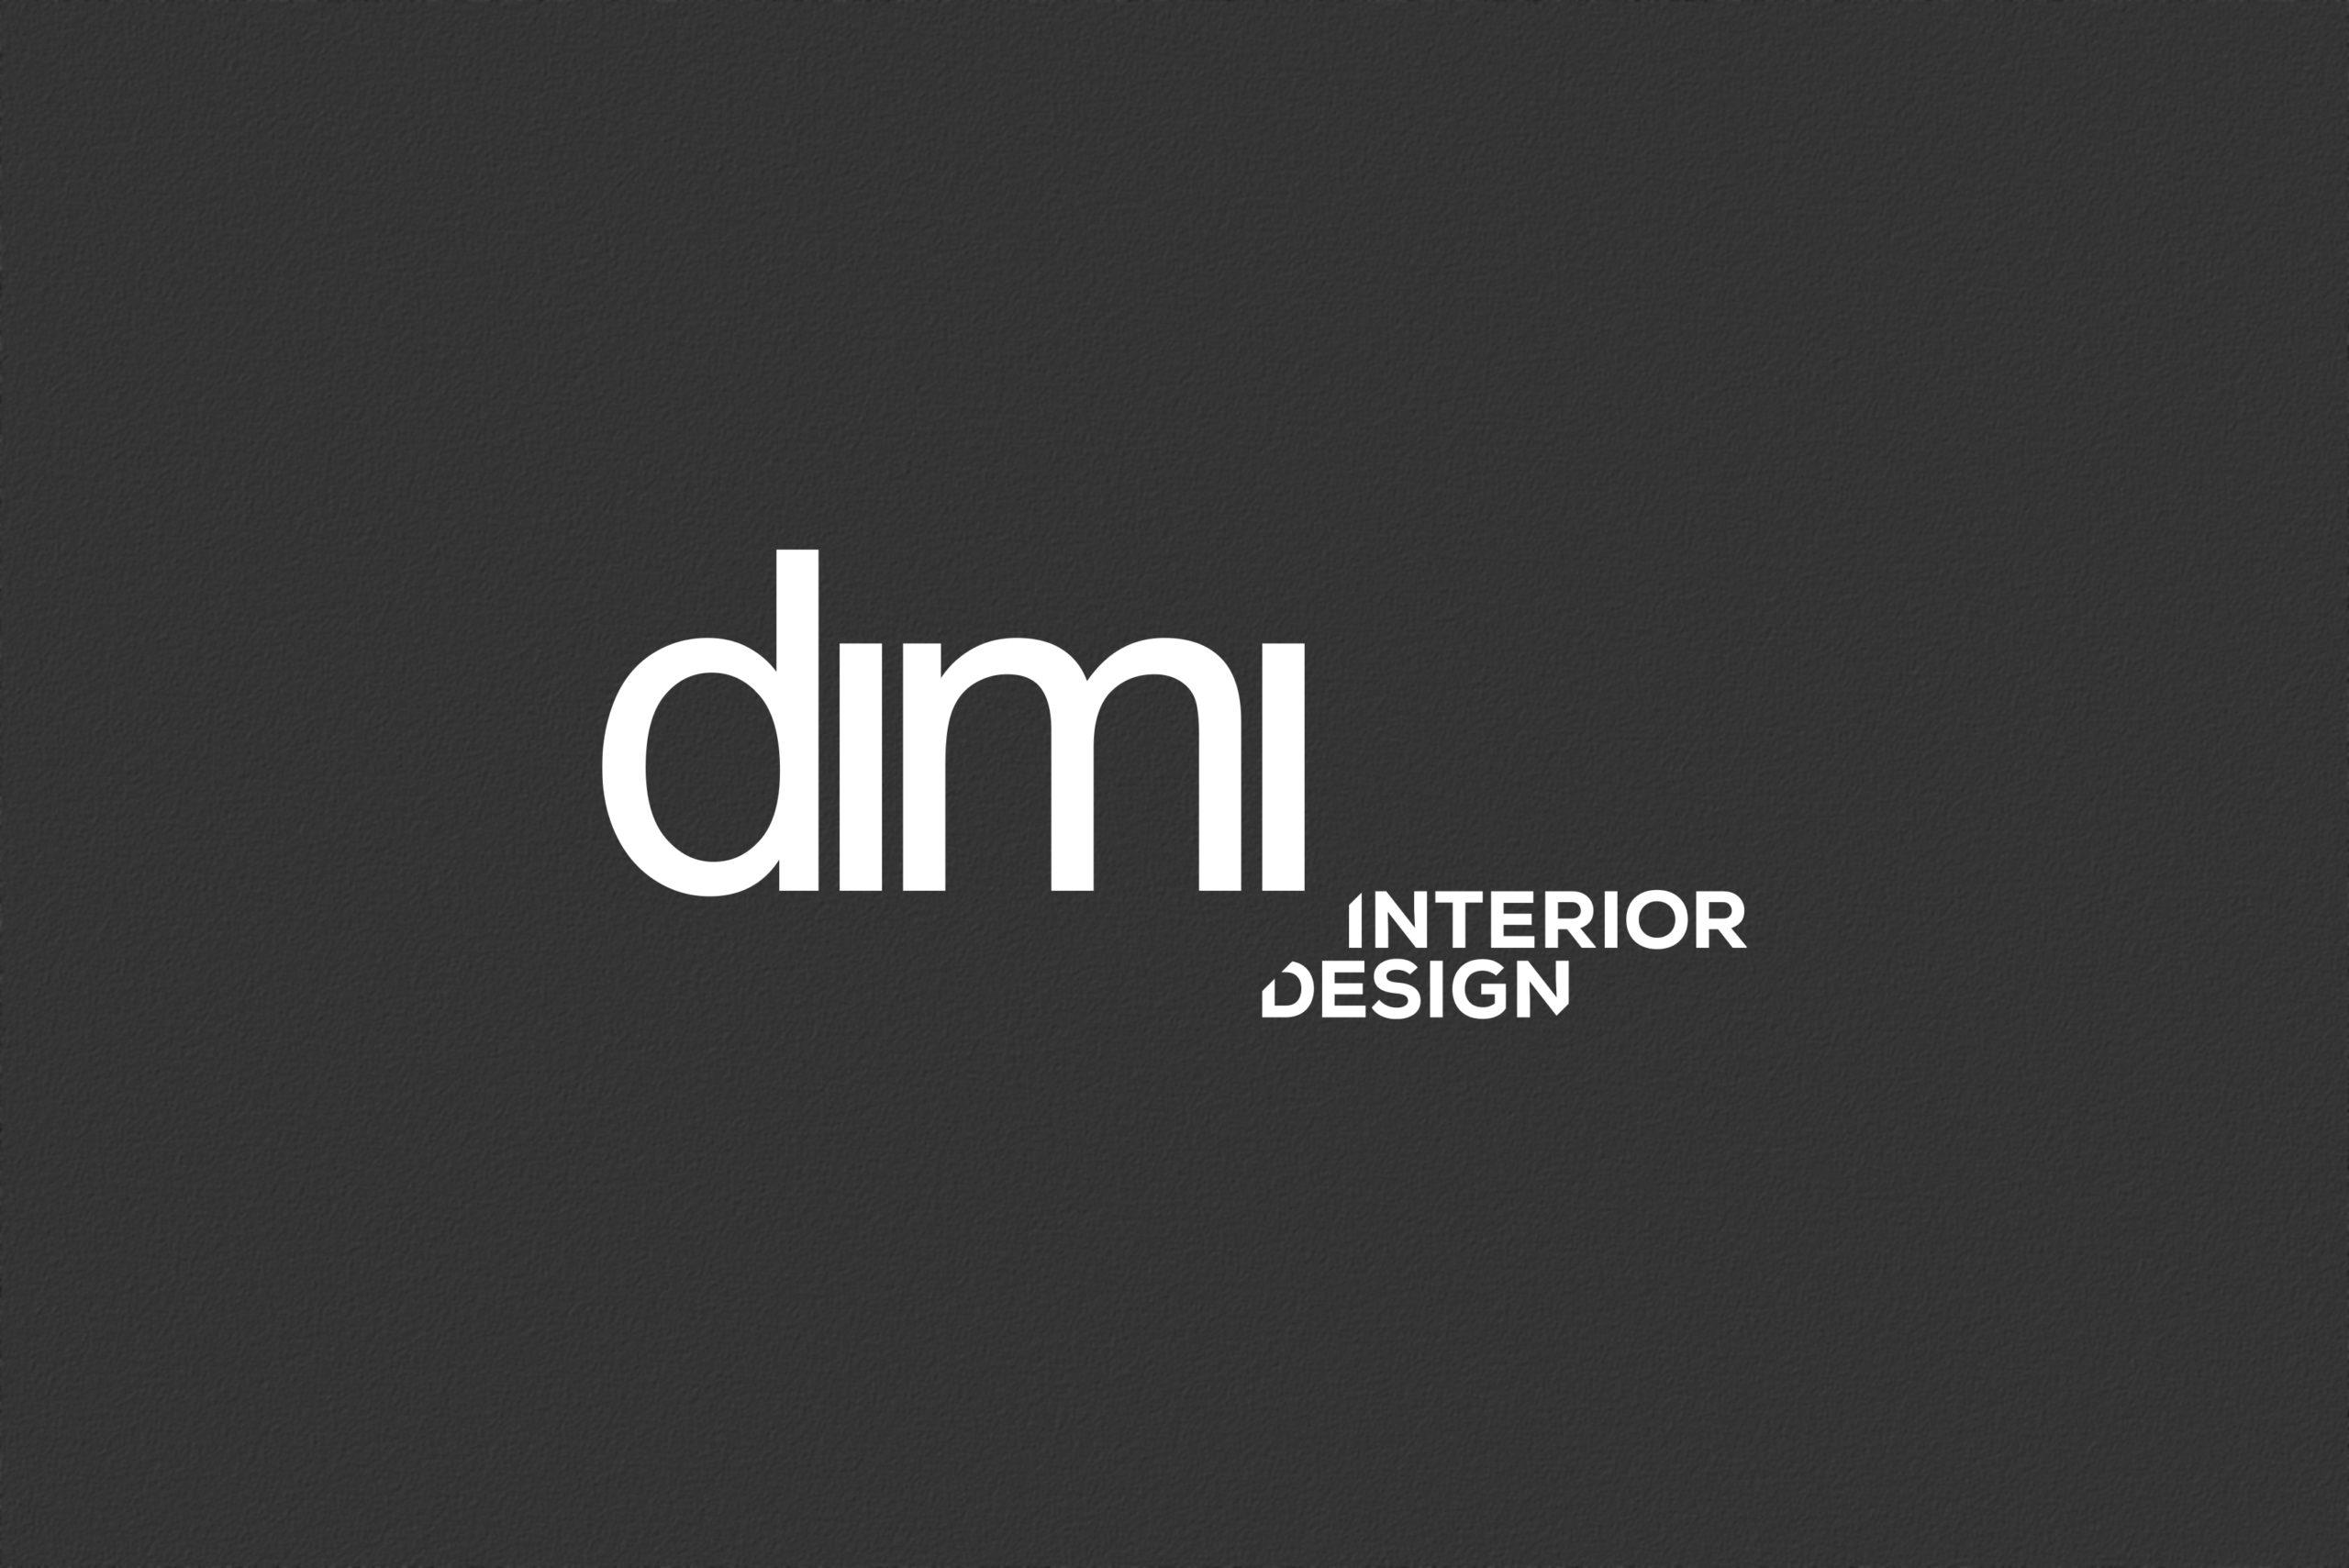 Papeterie - Dimi interior Design - Identité visuelle - Damien Rossier Graphisme Logotype